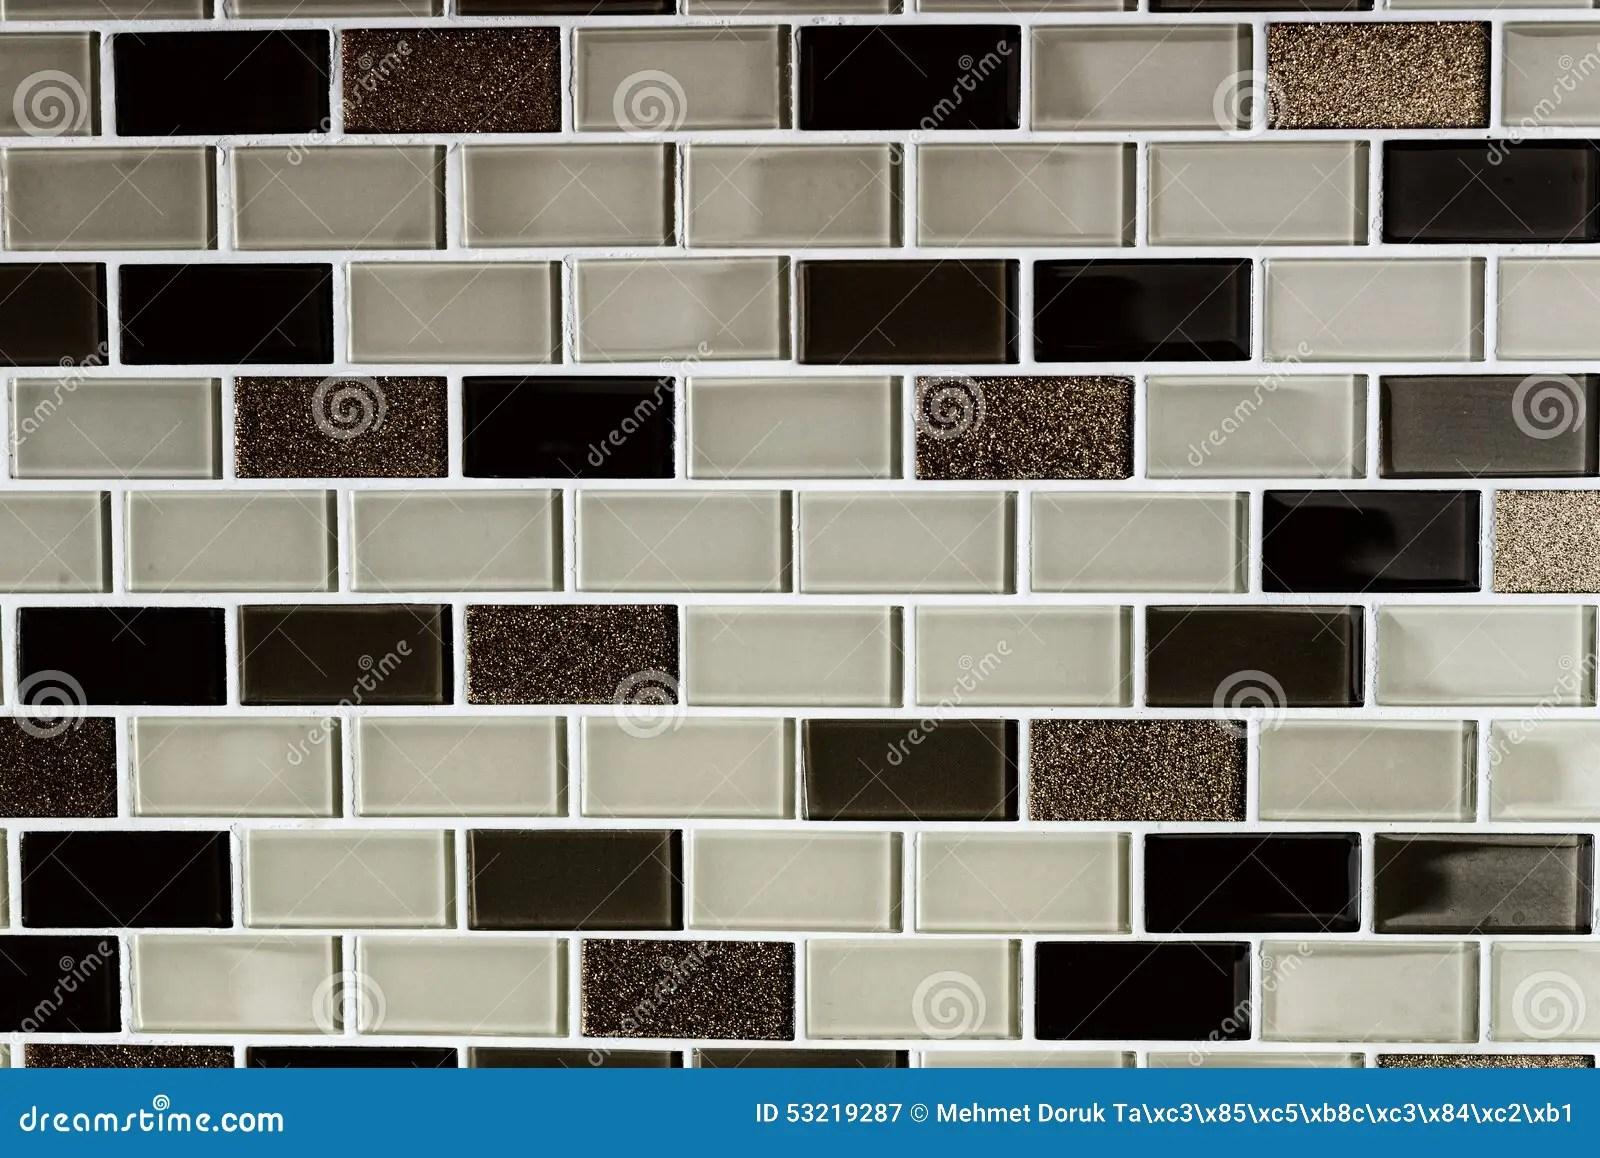 kitchen walls wall mounted faucet with sprayer 厨房墙壁瓦片库存图片 图片包括有几何 简单 厨房 不列塔尼的 封锁 厨房墙壁瓦片